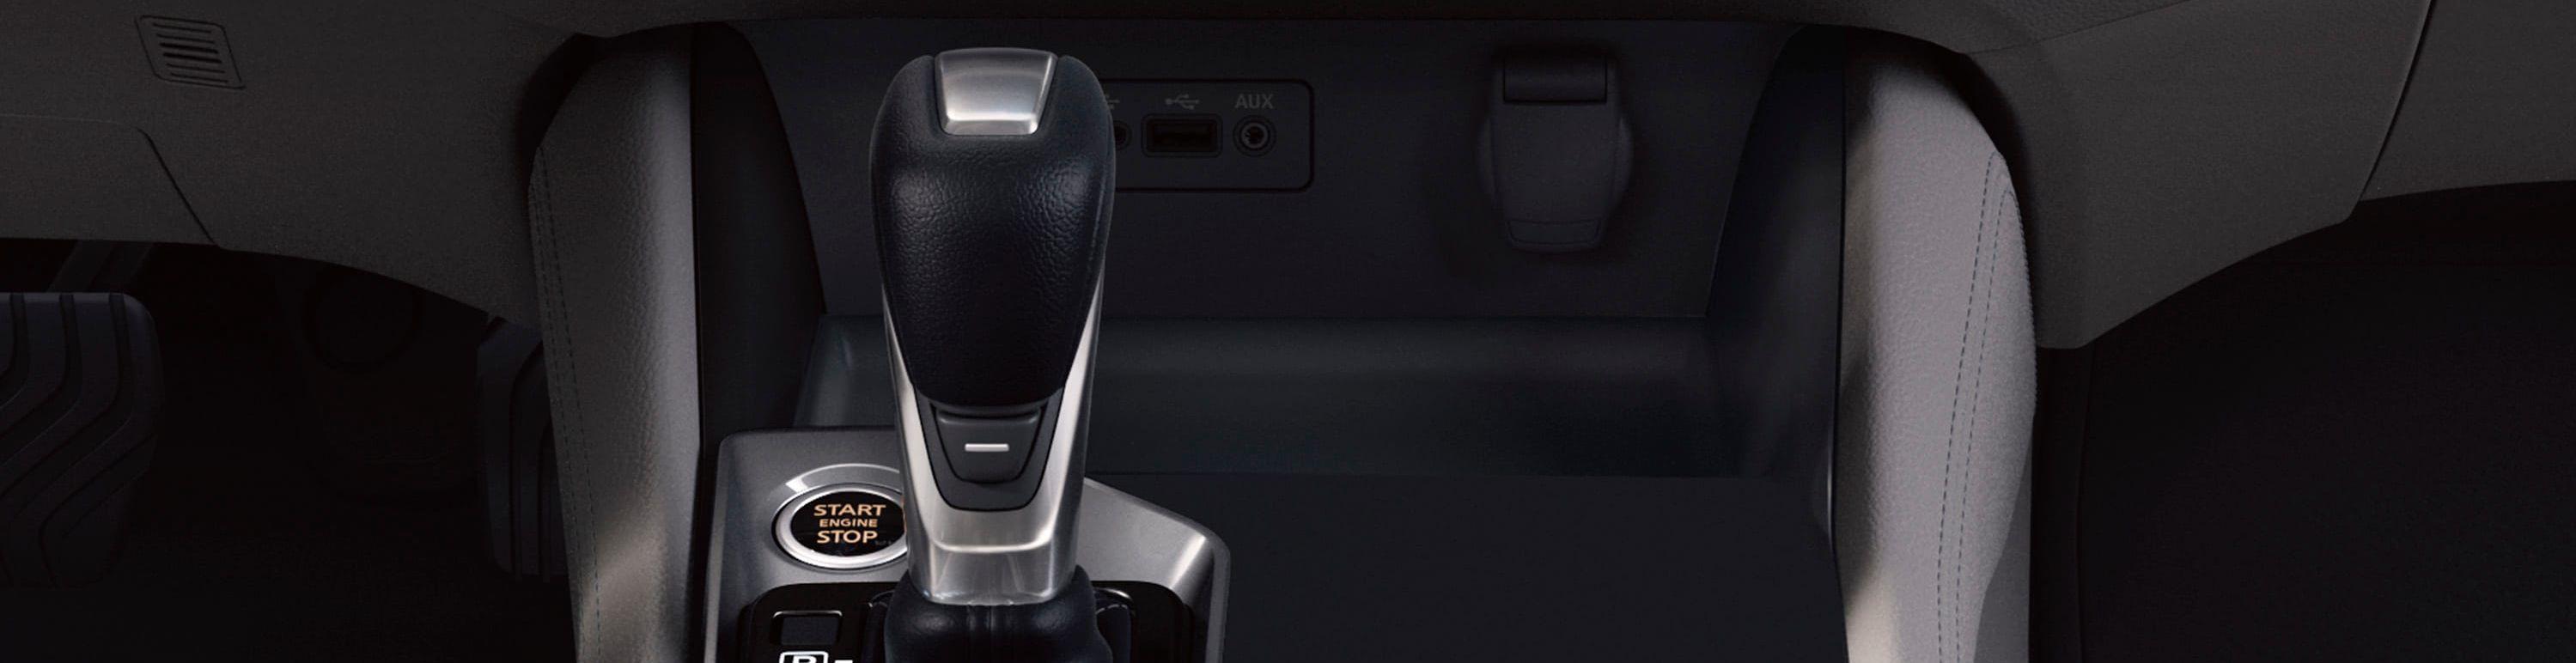 2019 Nissan Altima Shift Knob